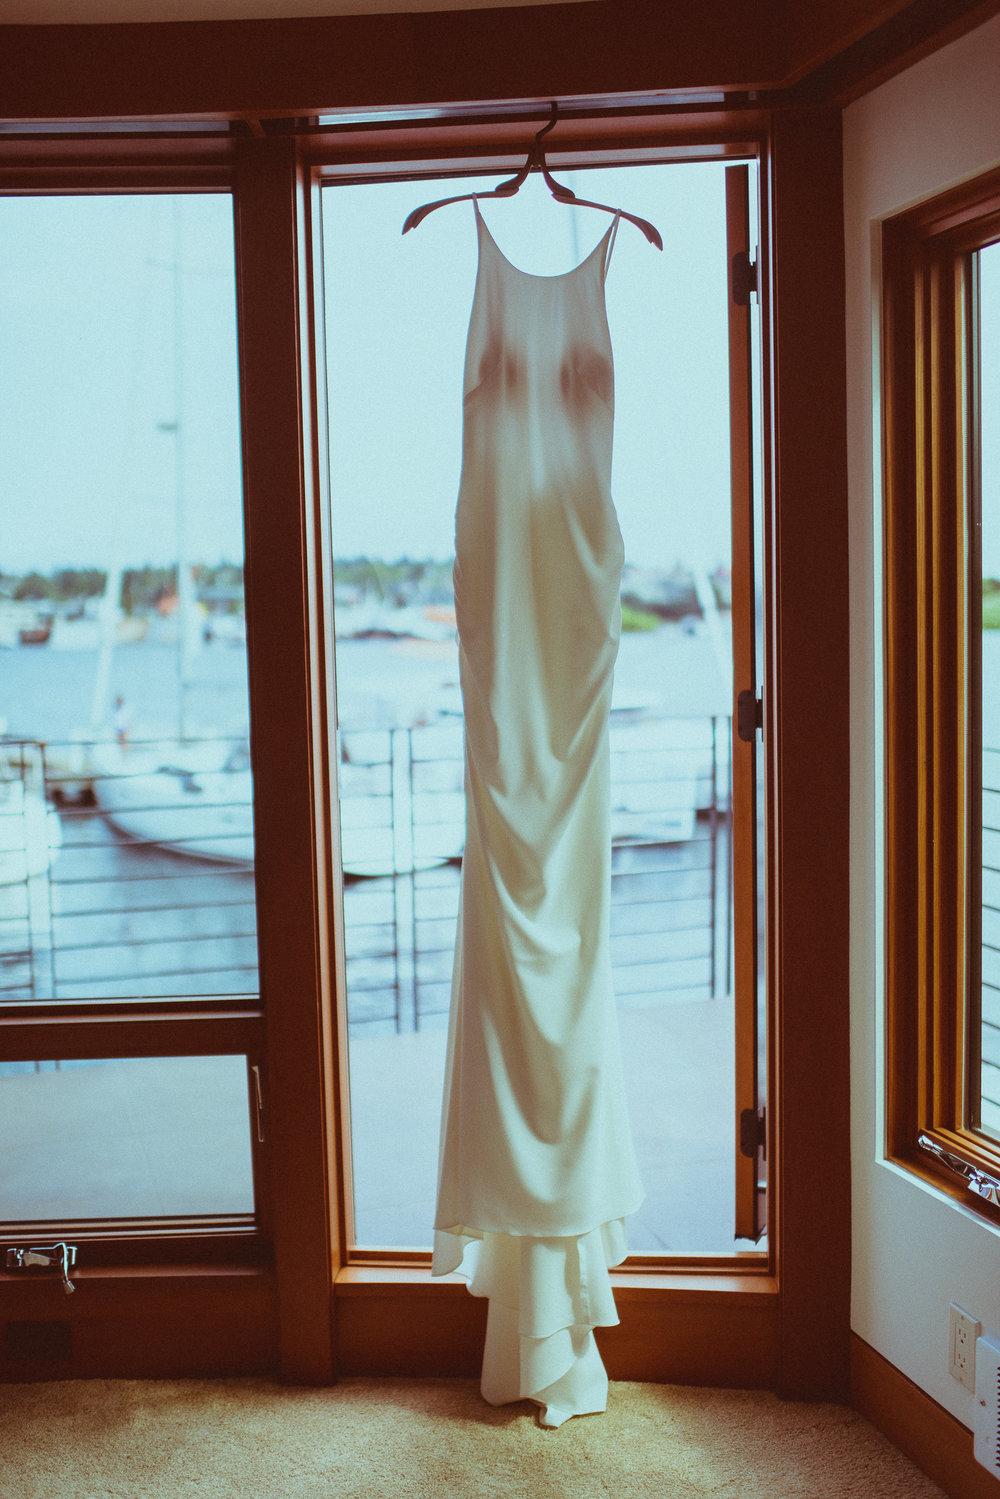 BEST_CHICAG_WEDDING_PHOTOGRAPHER_ZOE_RAIN_-5.jpg